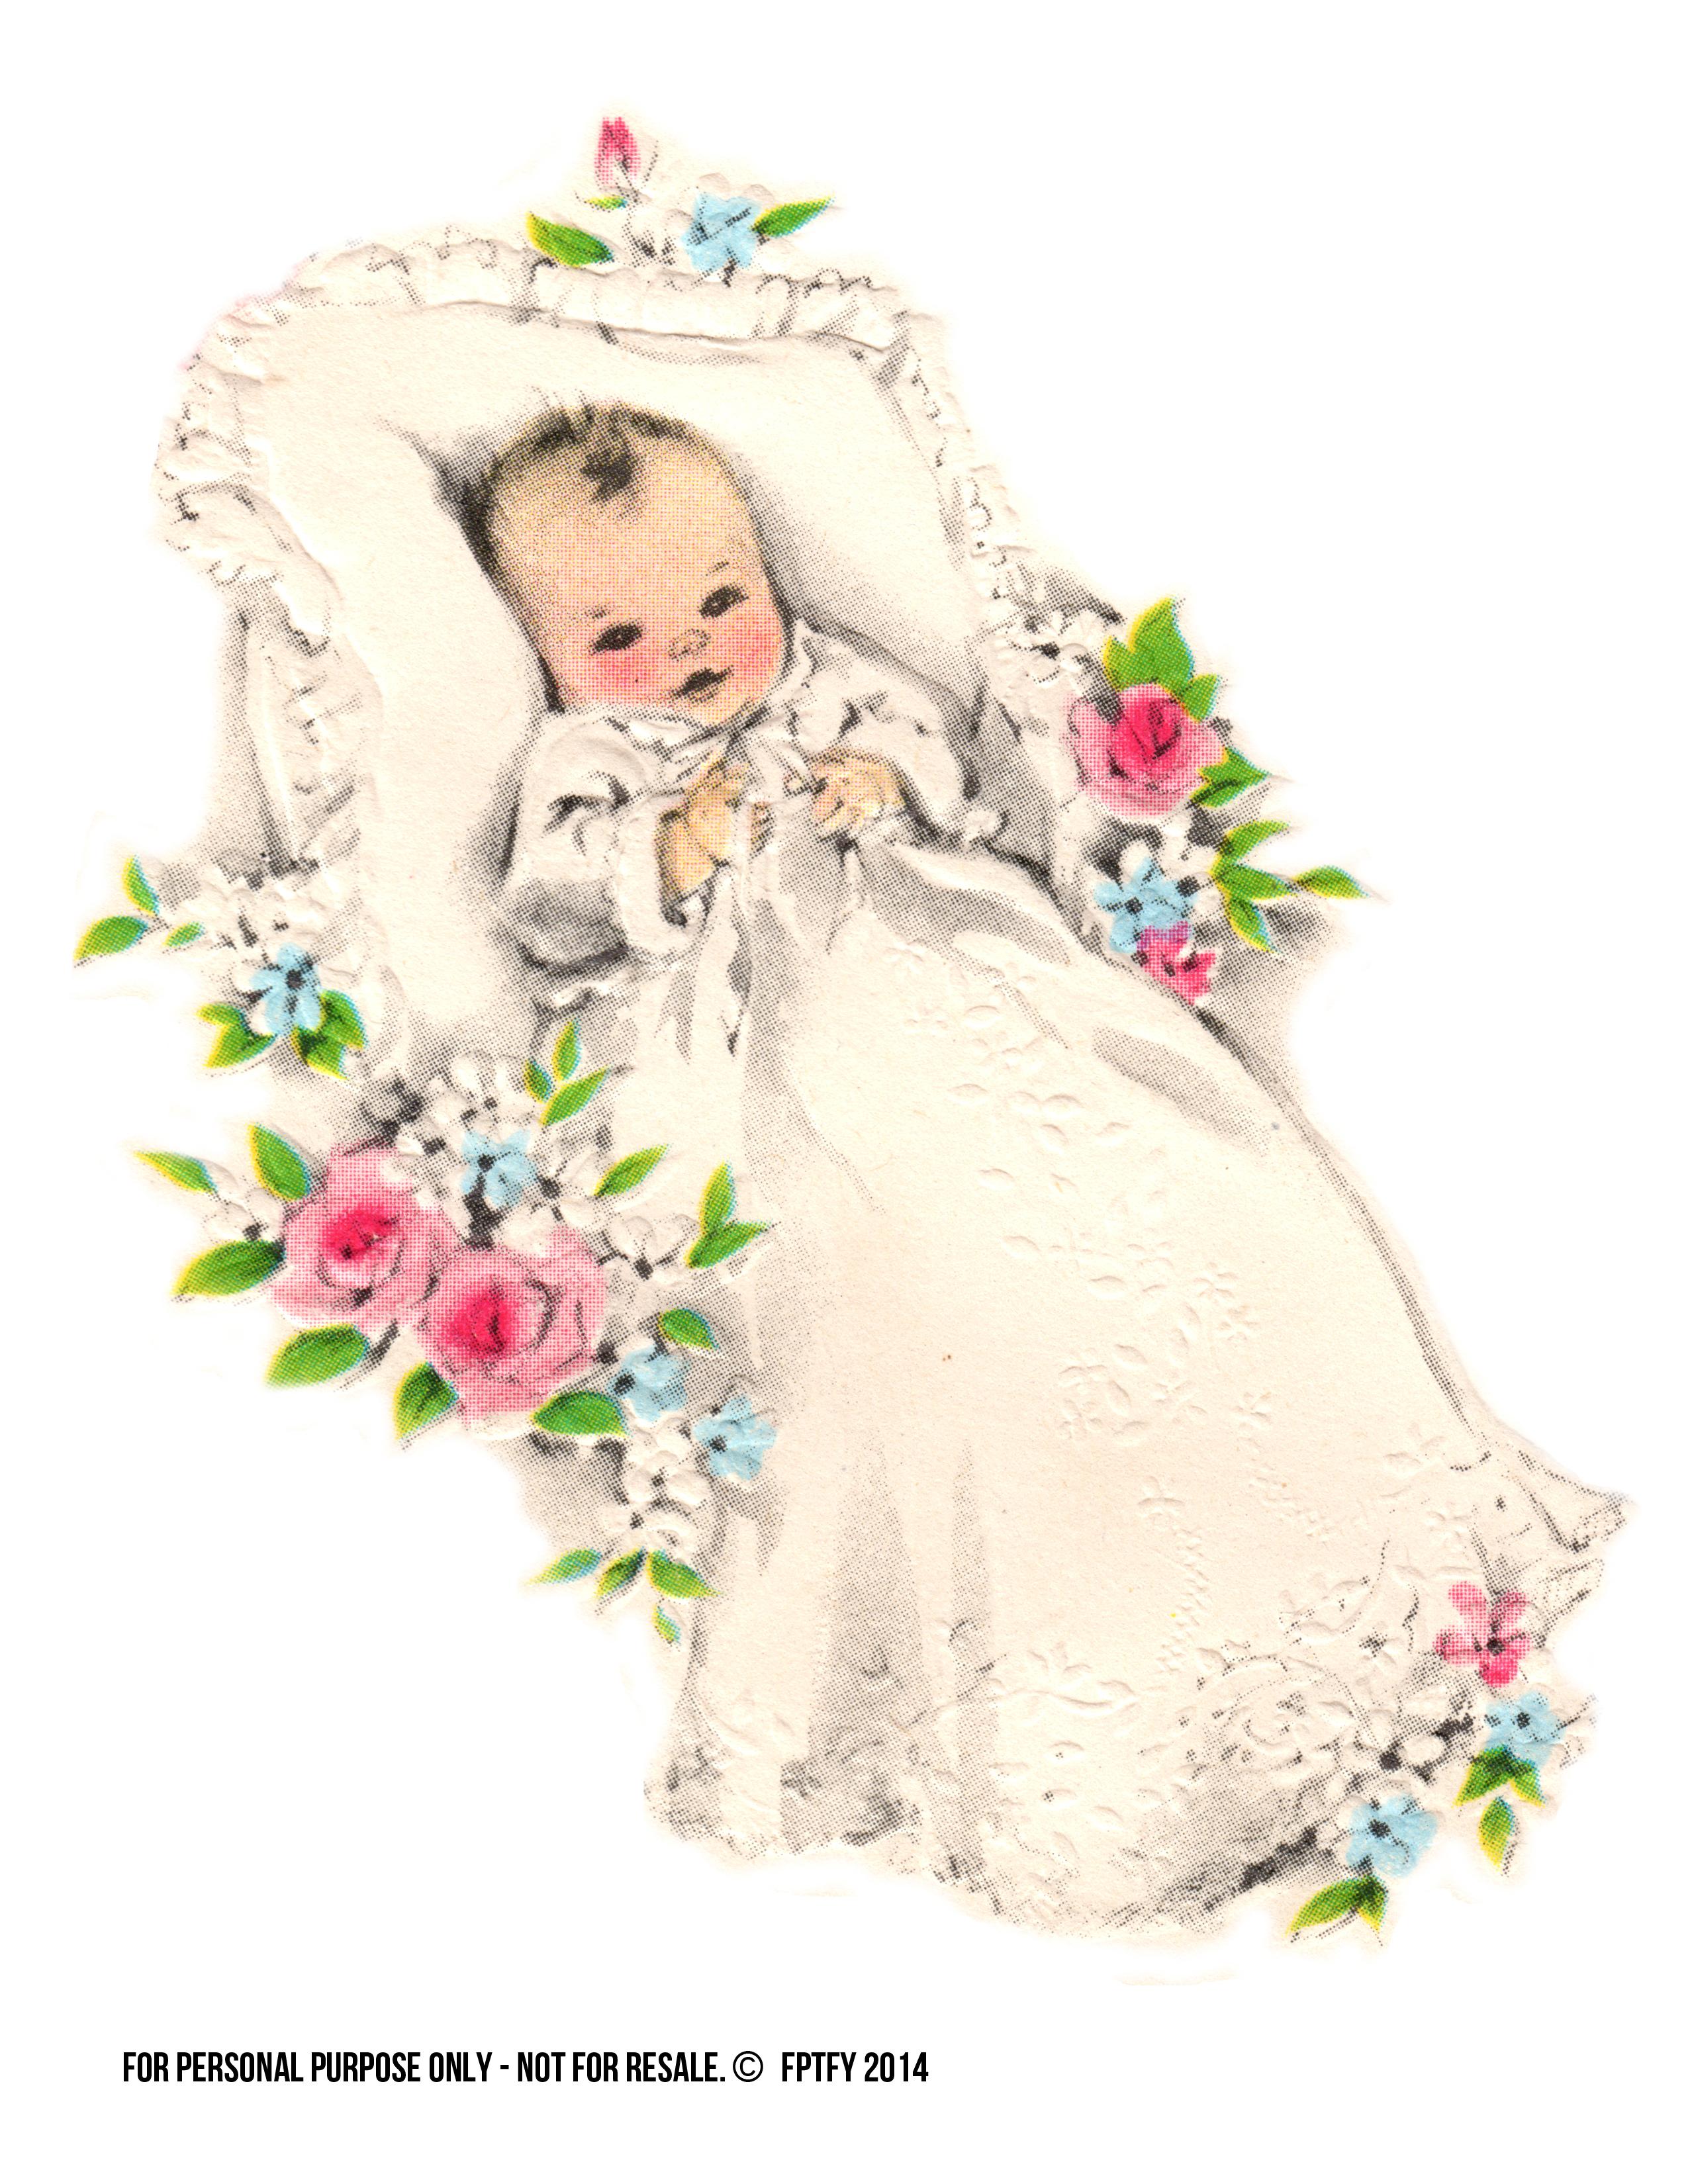 Baby girl baptism clipart banner transparent download Free baby baptism clipart - ClipartFest banner transparent download